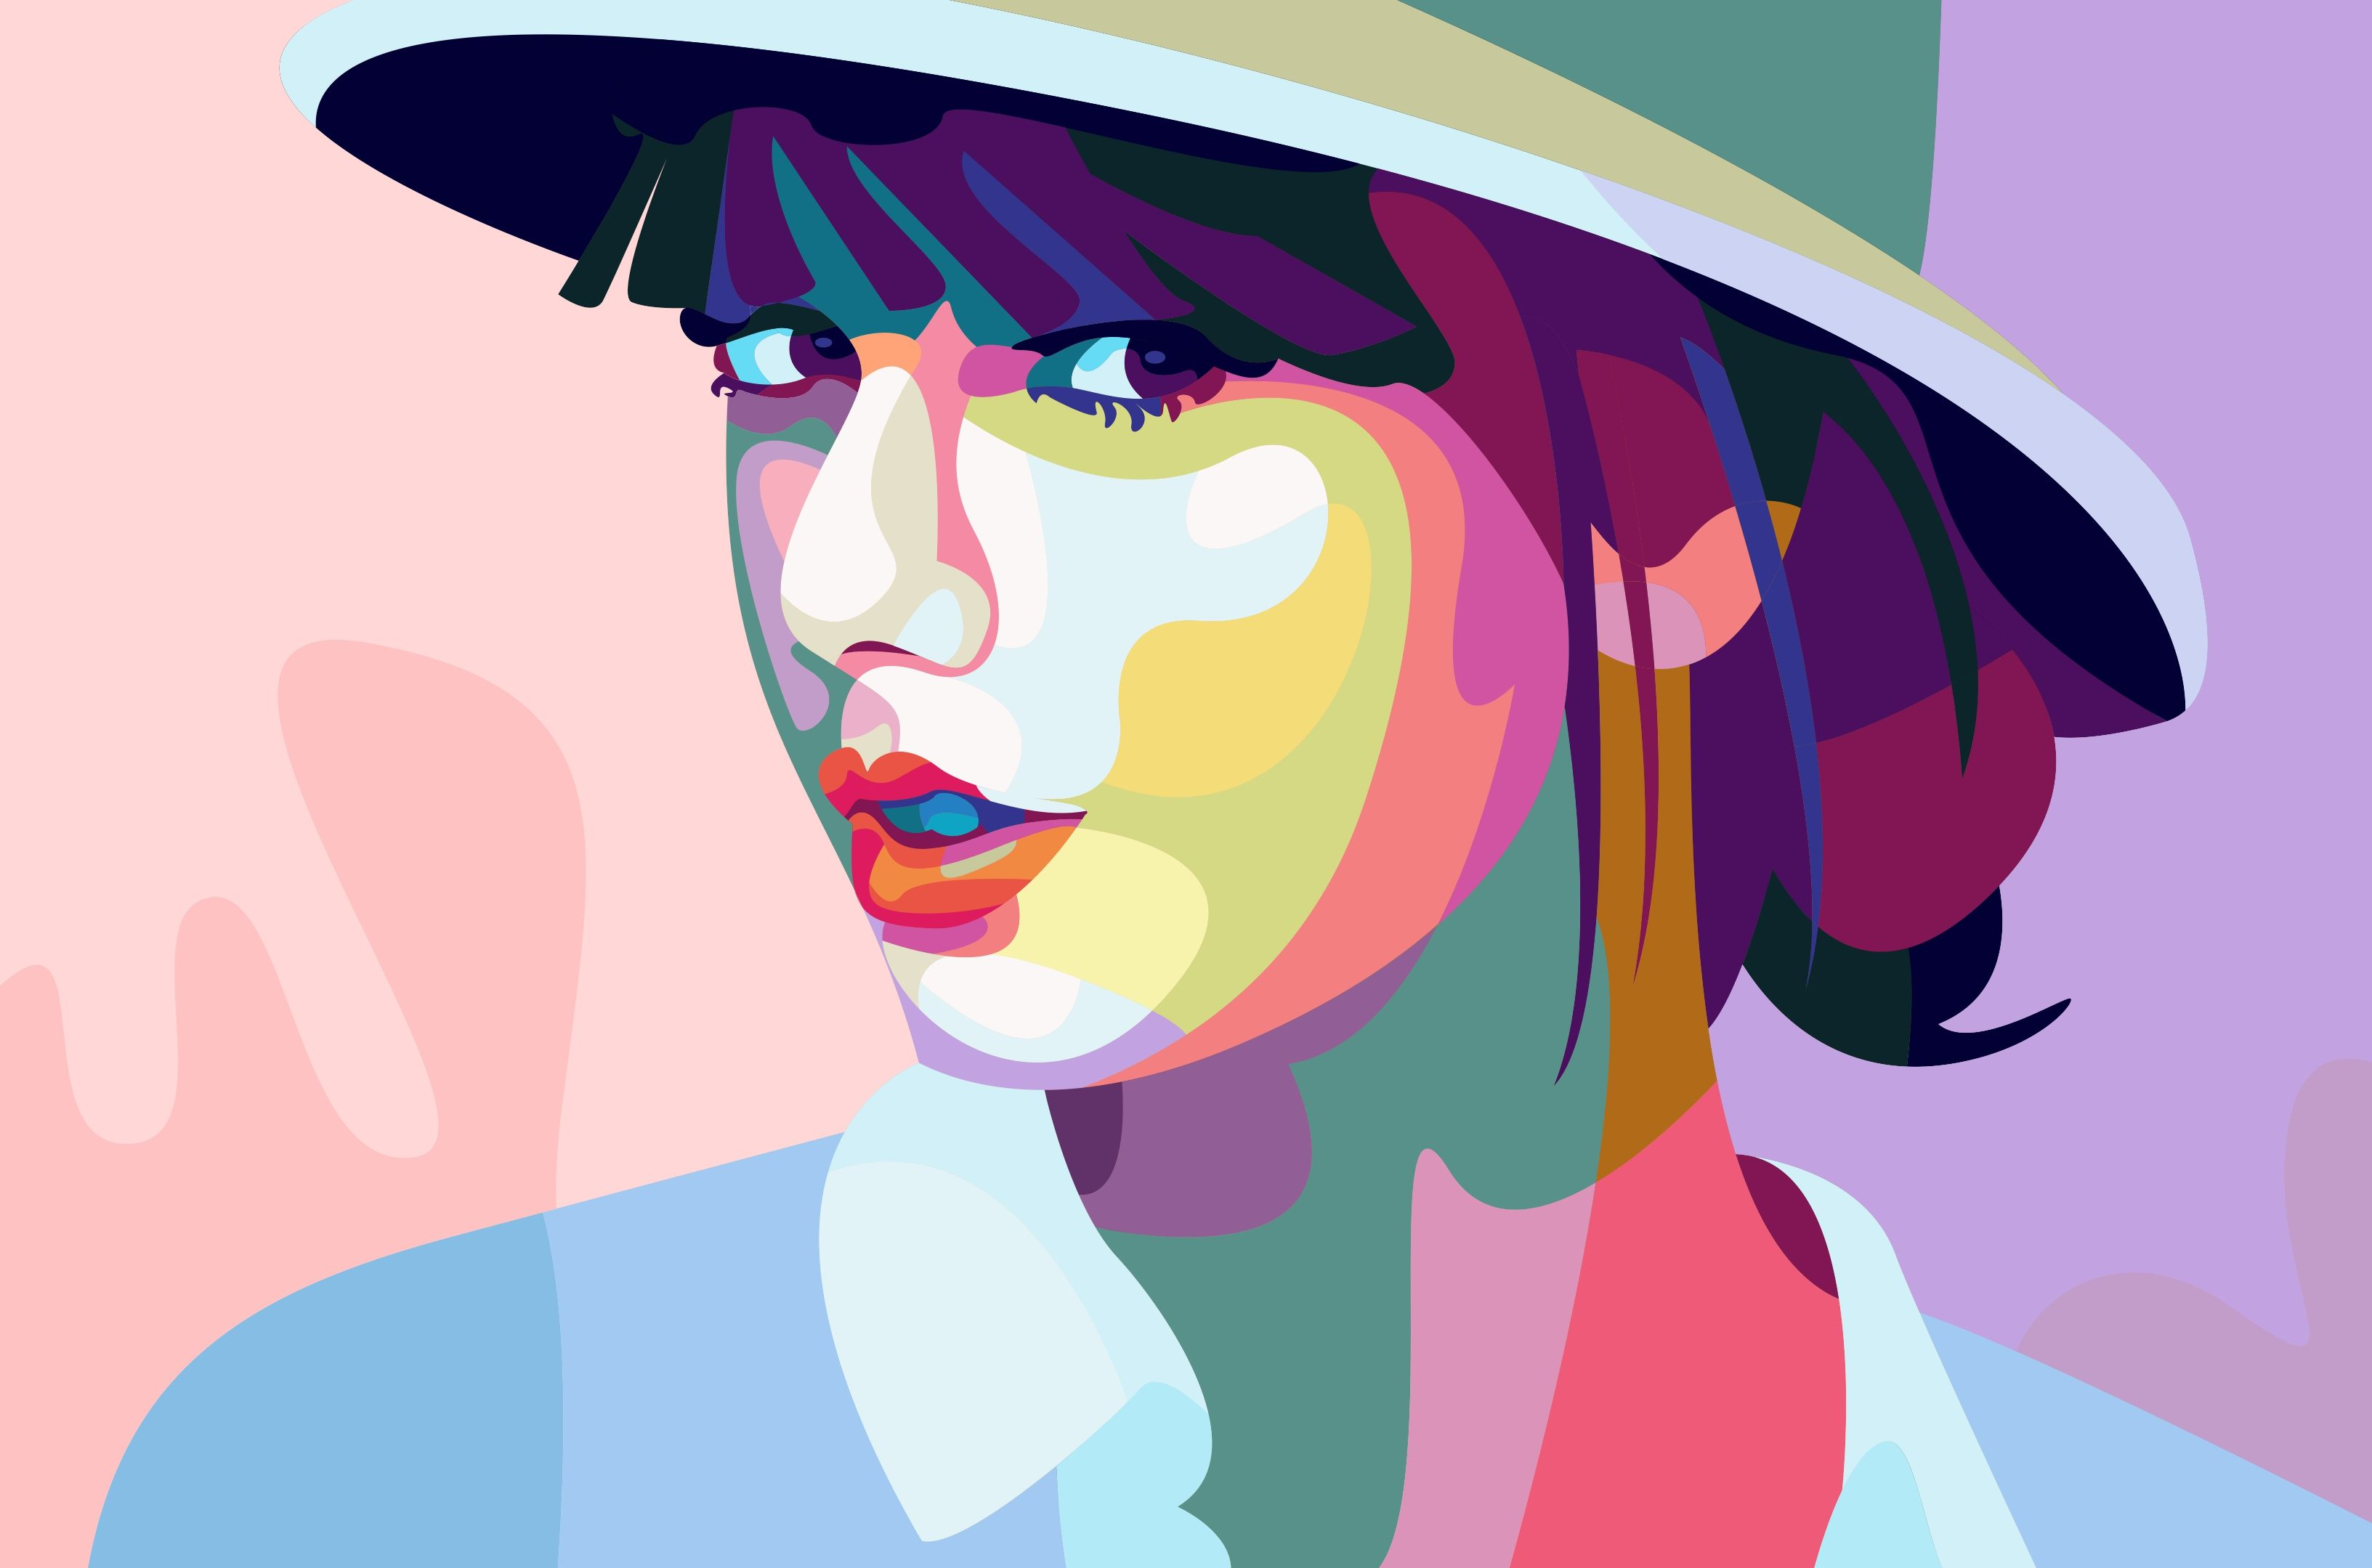 Download #taylorswift #popart #lovestory #portrait #vector # ...